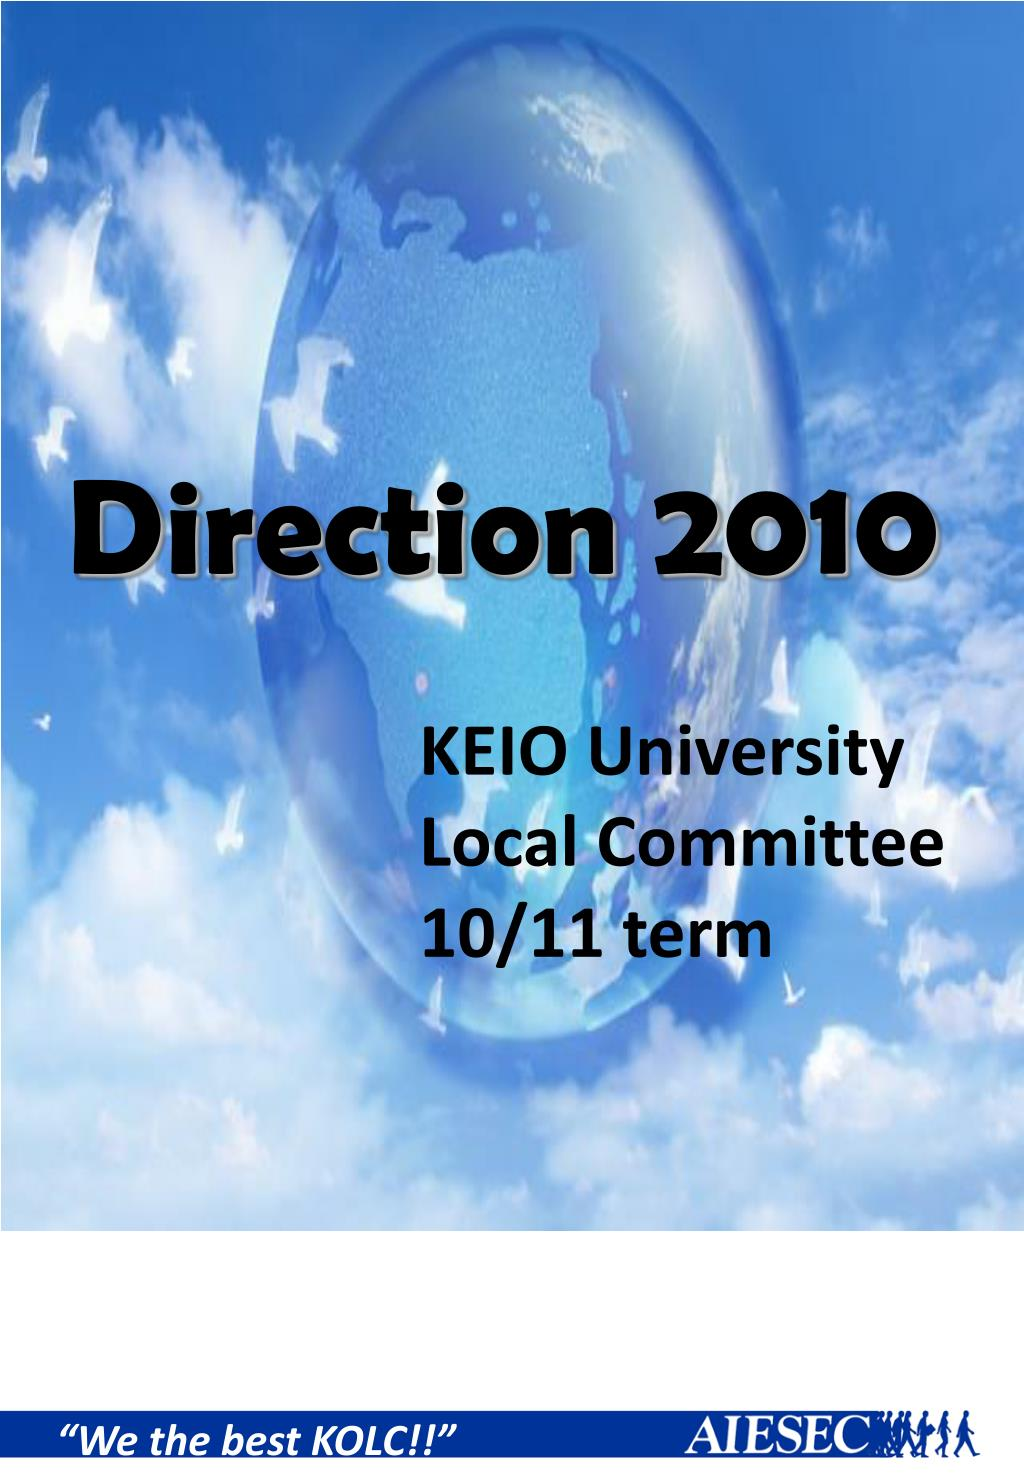 Direction 2010